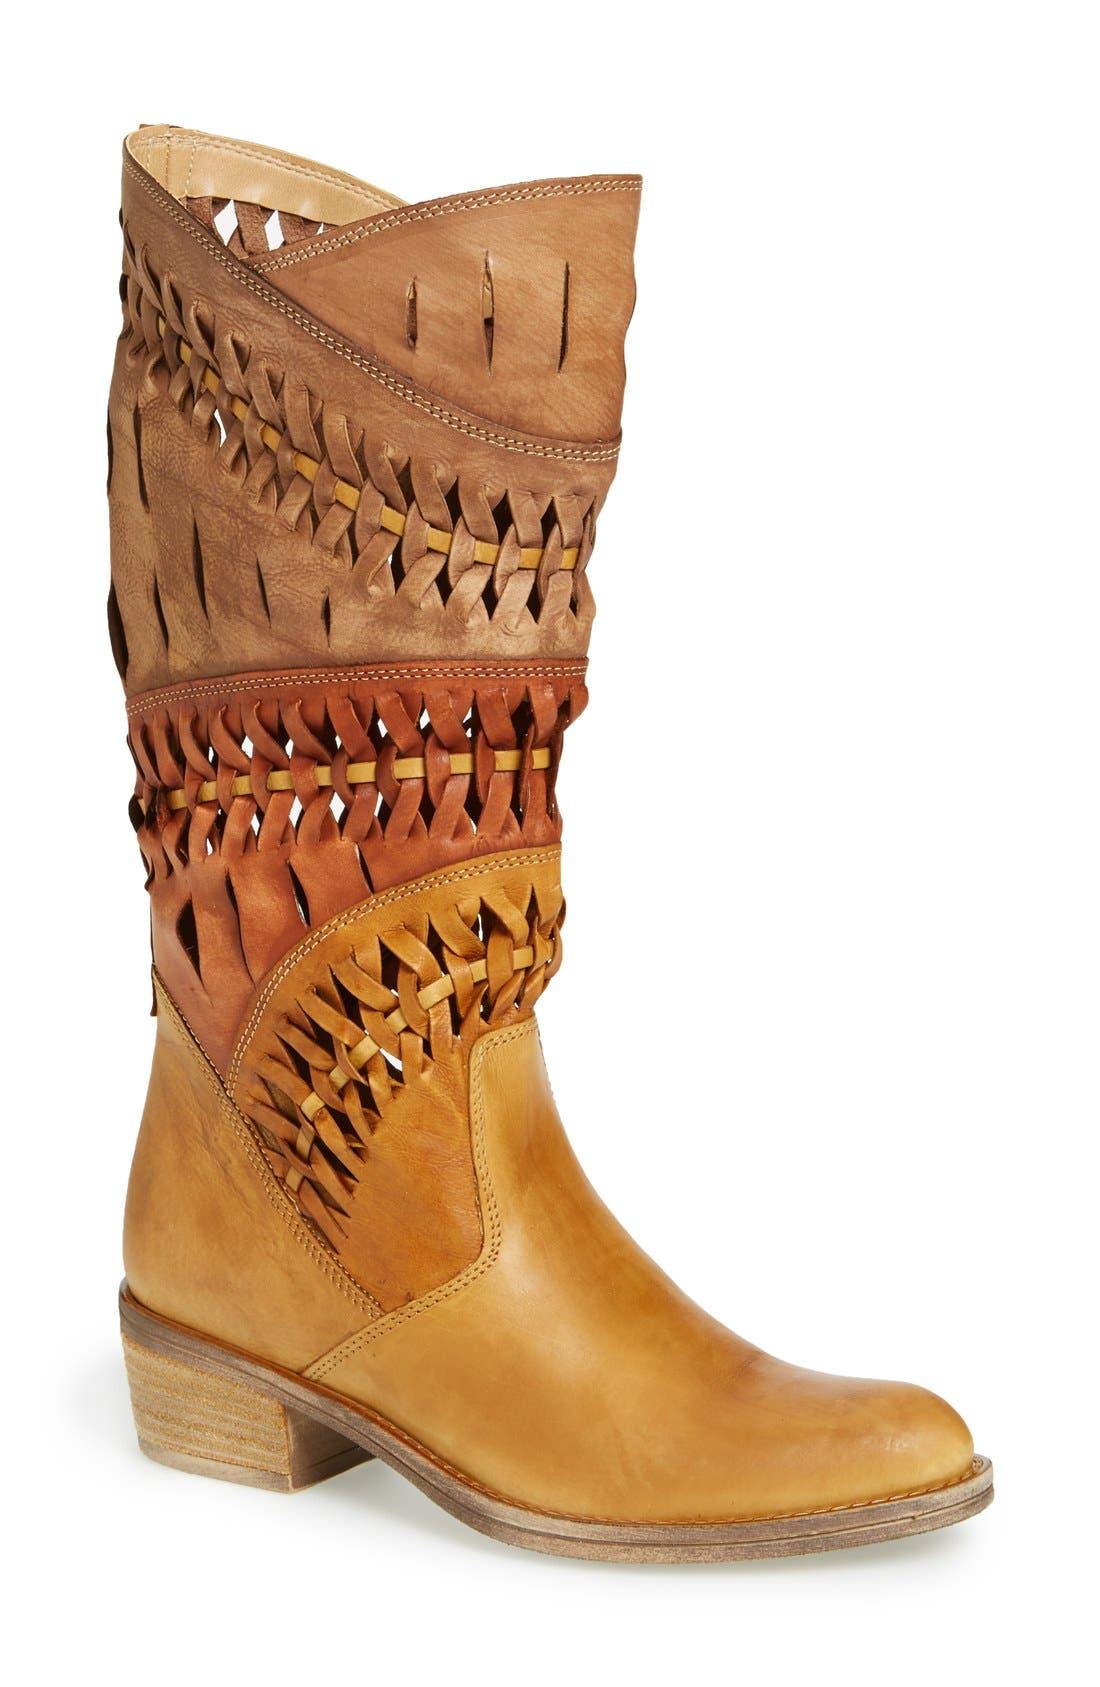 Main Image - Summit 'Tulia' Leather Western Boot (Women)